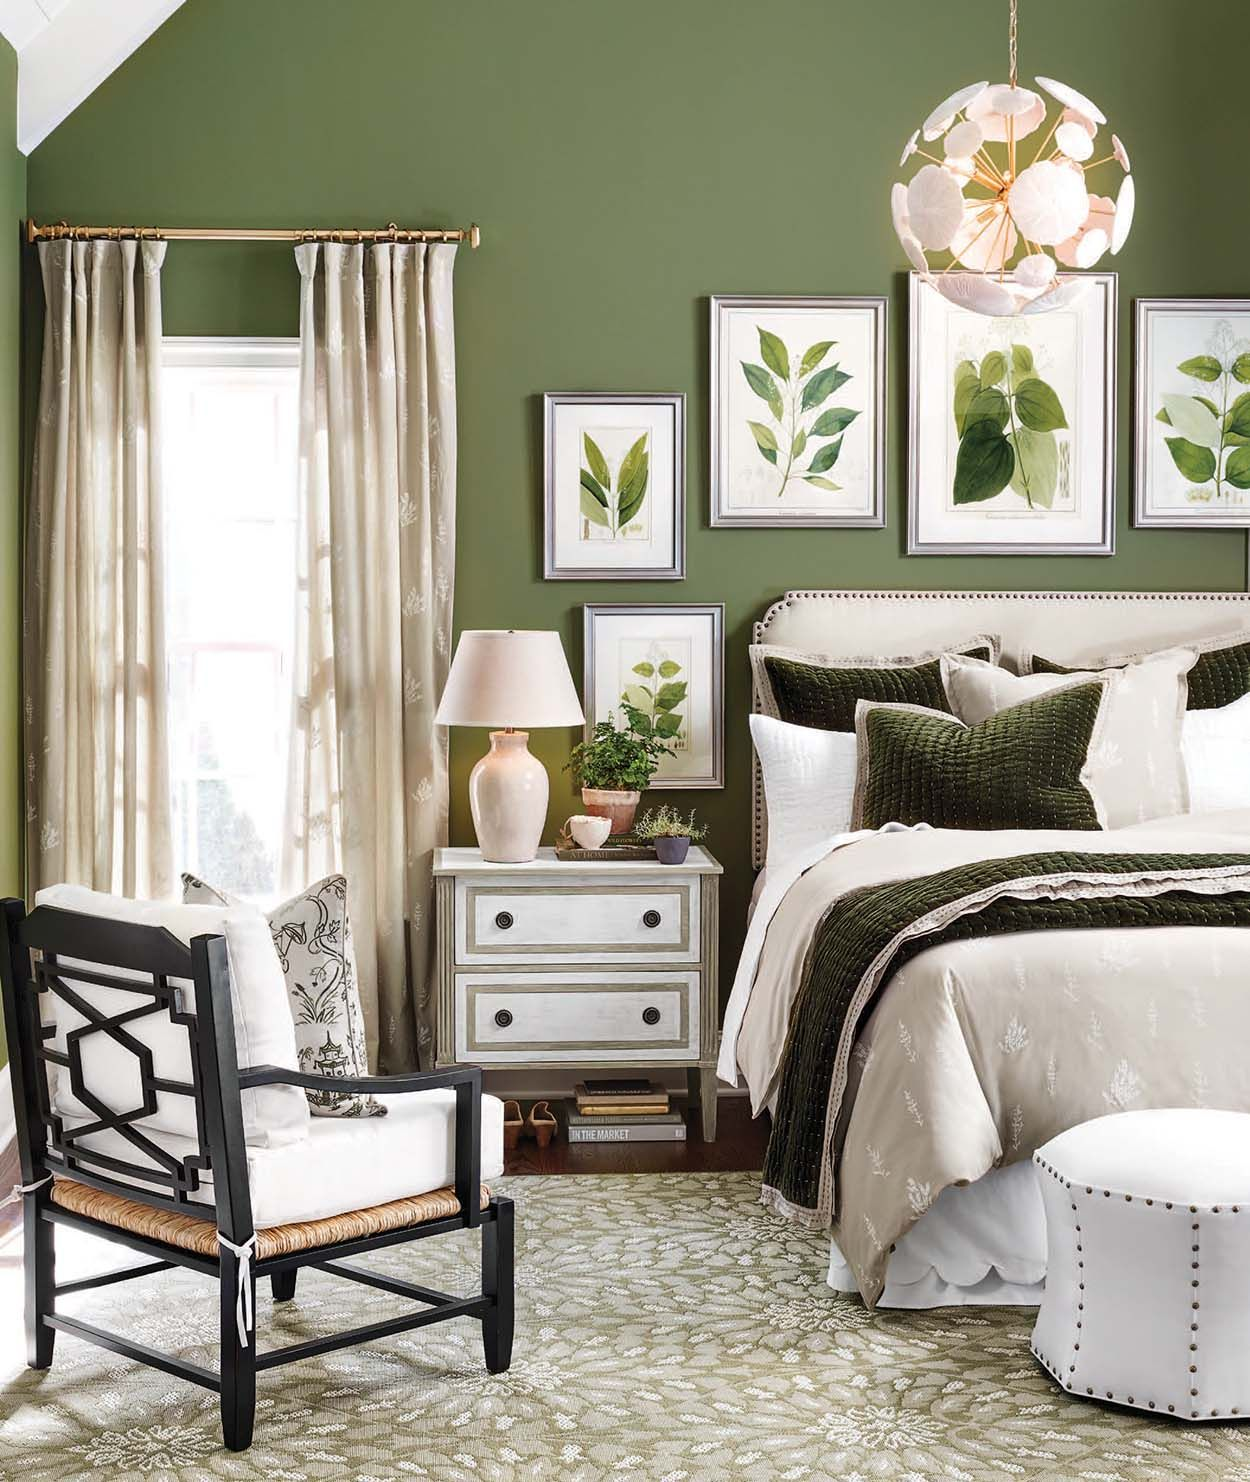 Bedroom decorating ideas   Green bedroom walls, Green ...